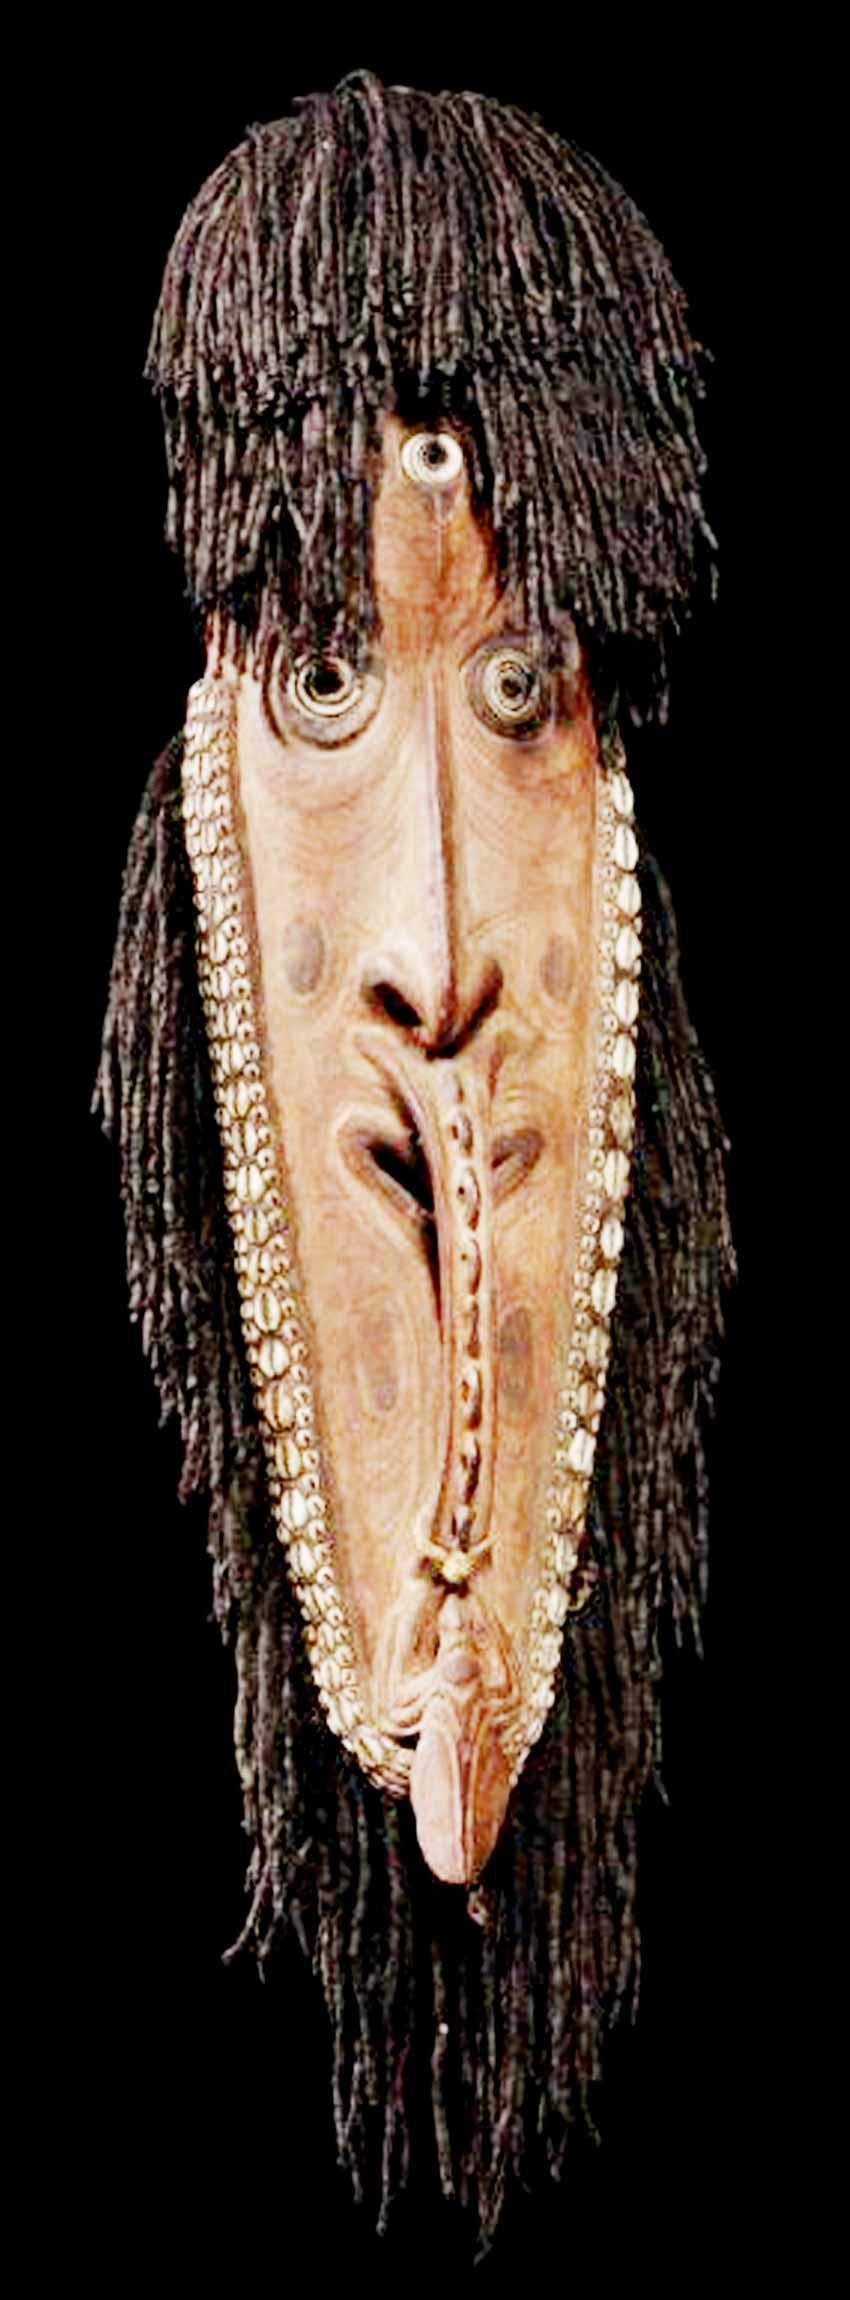 Phong phú mặt nạ Papua New Guinea - 9